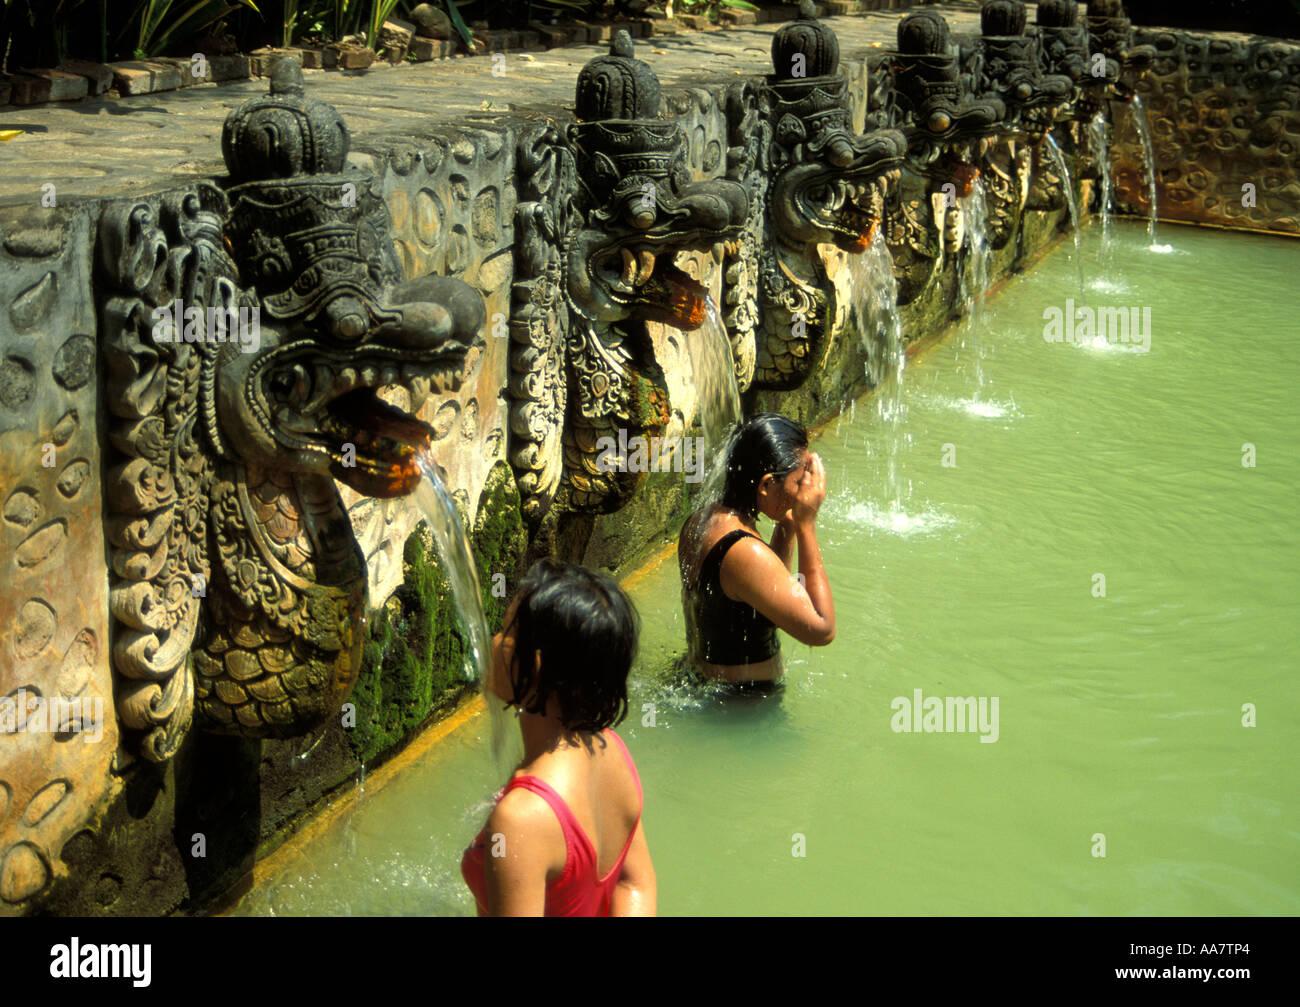 Images Of Hot Bali Women 65